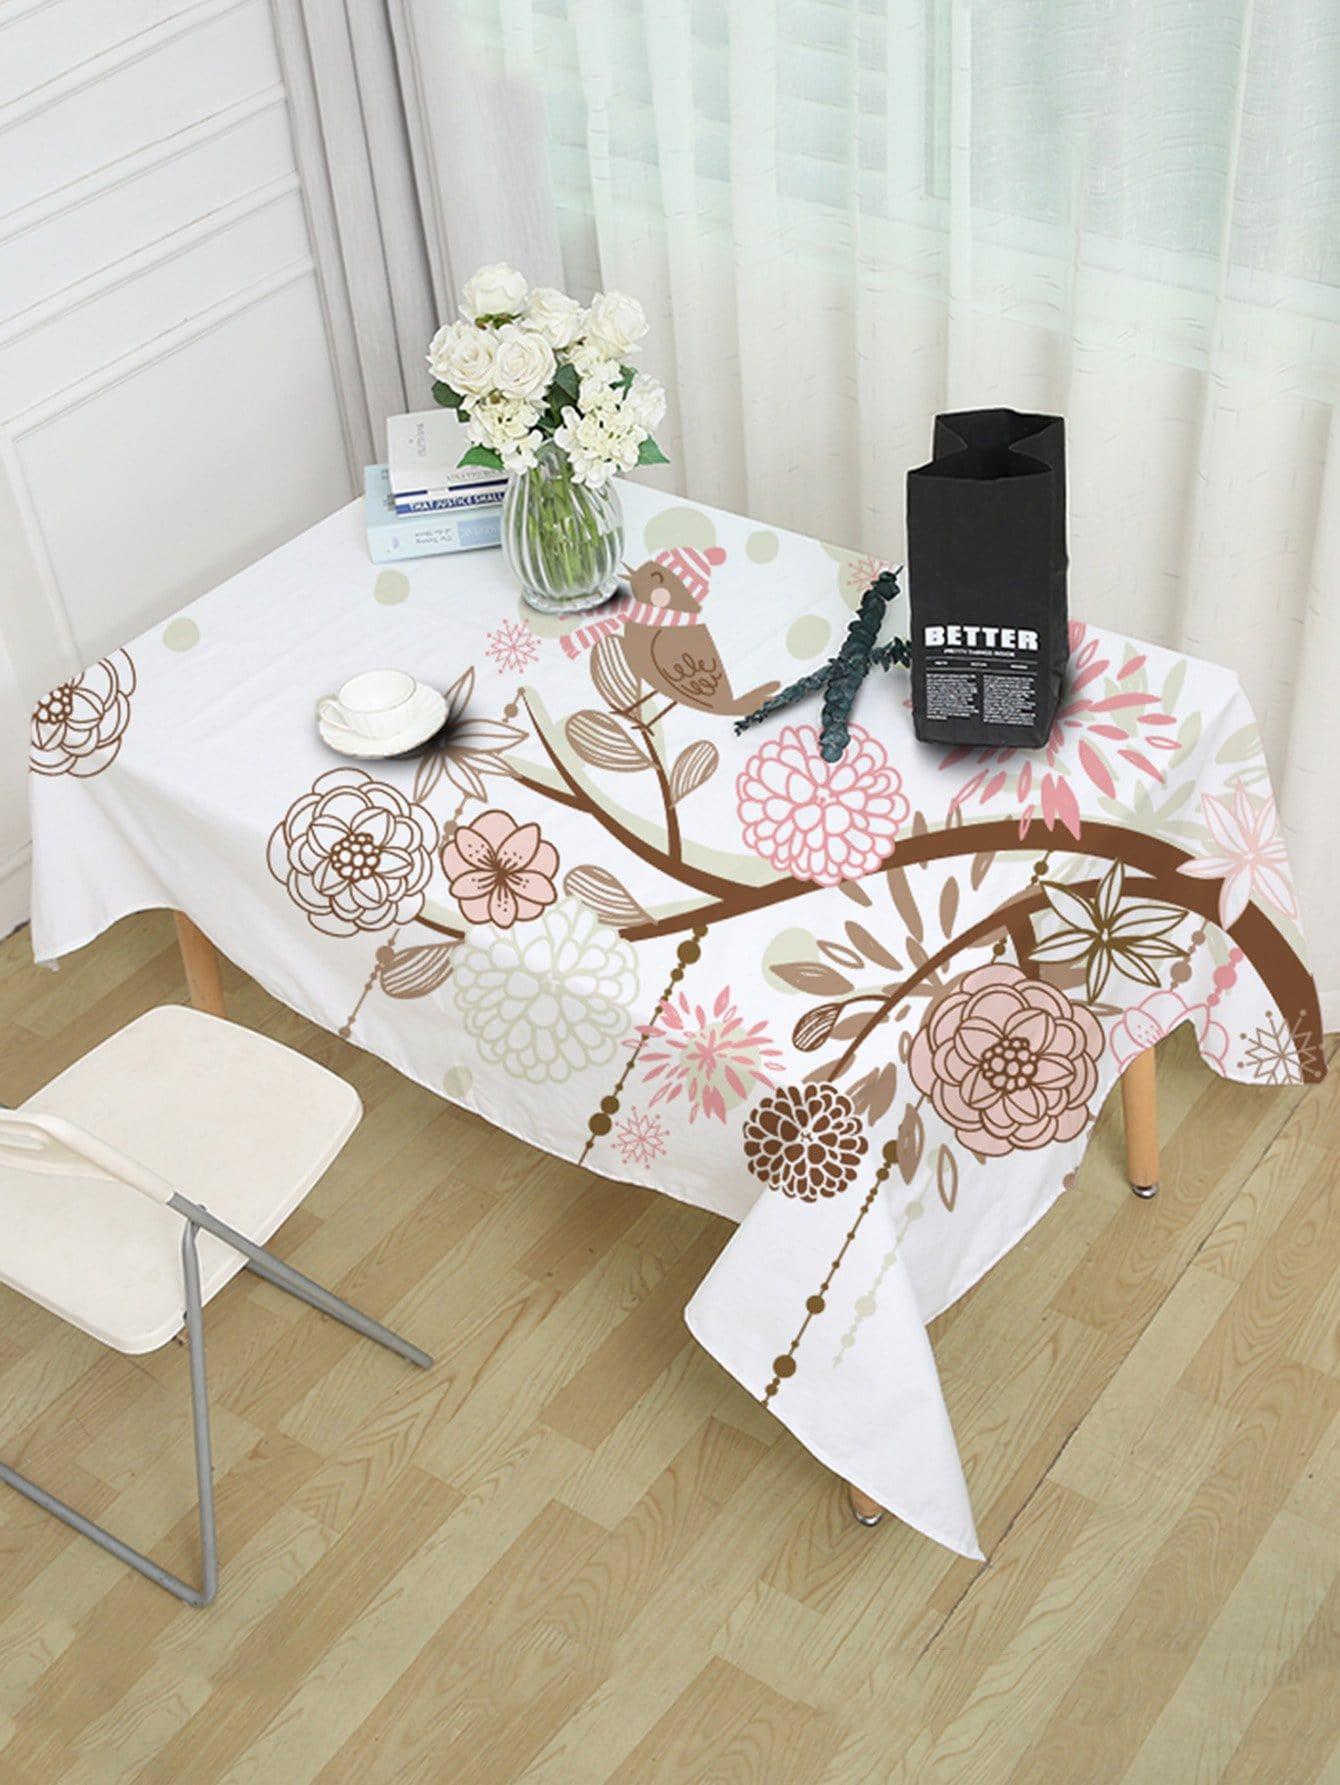 Floral Print Table Cloth